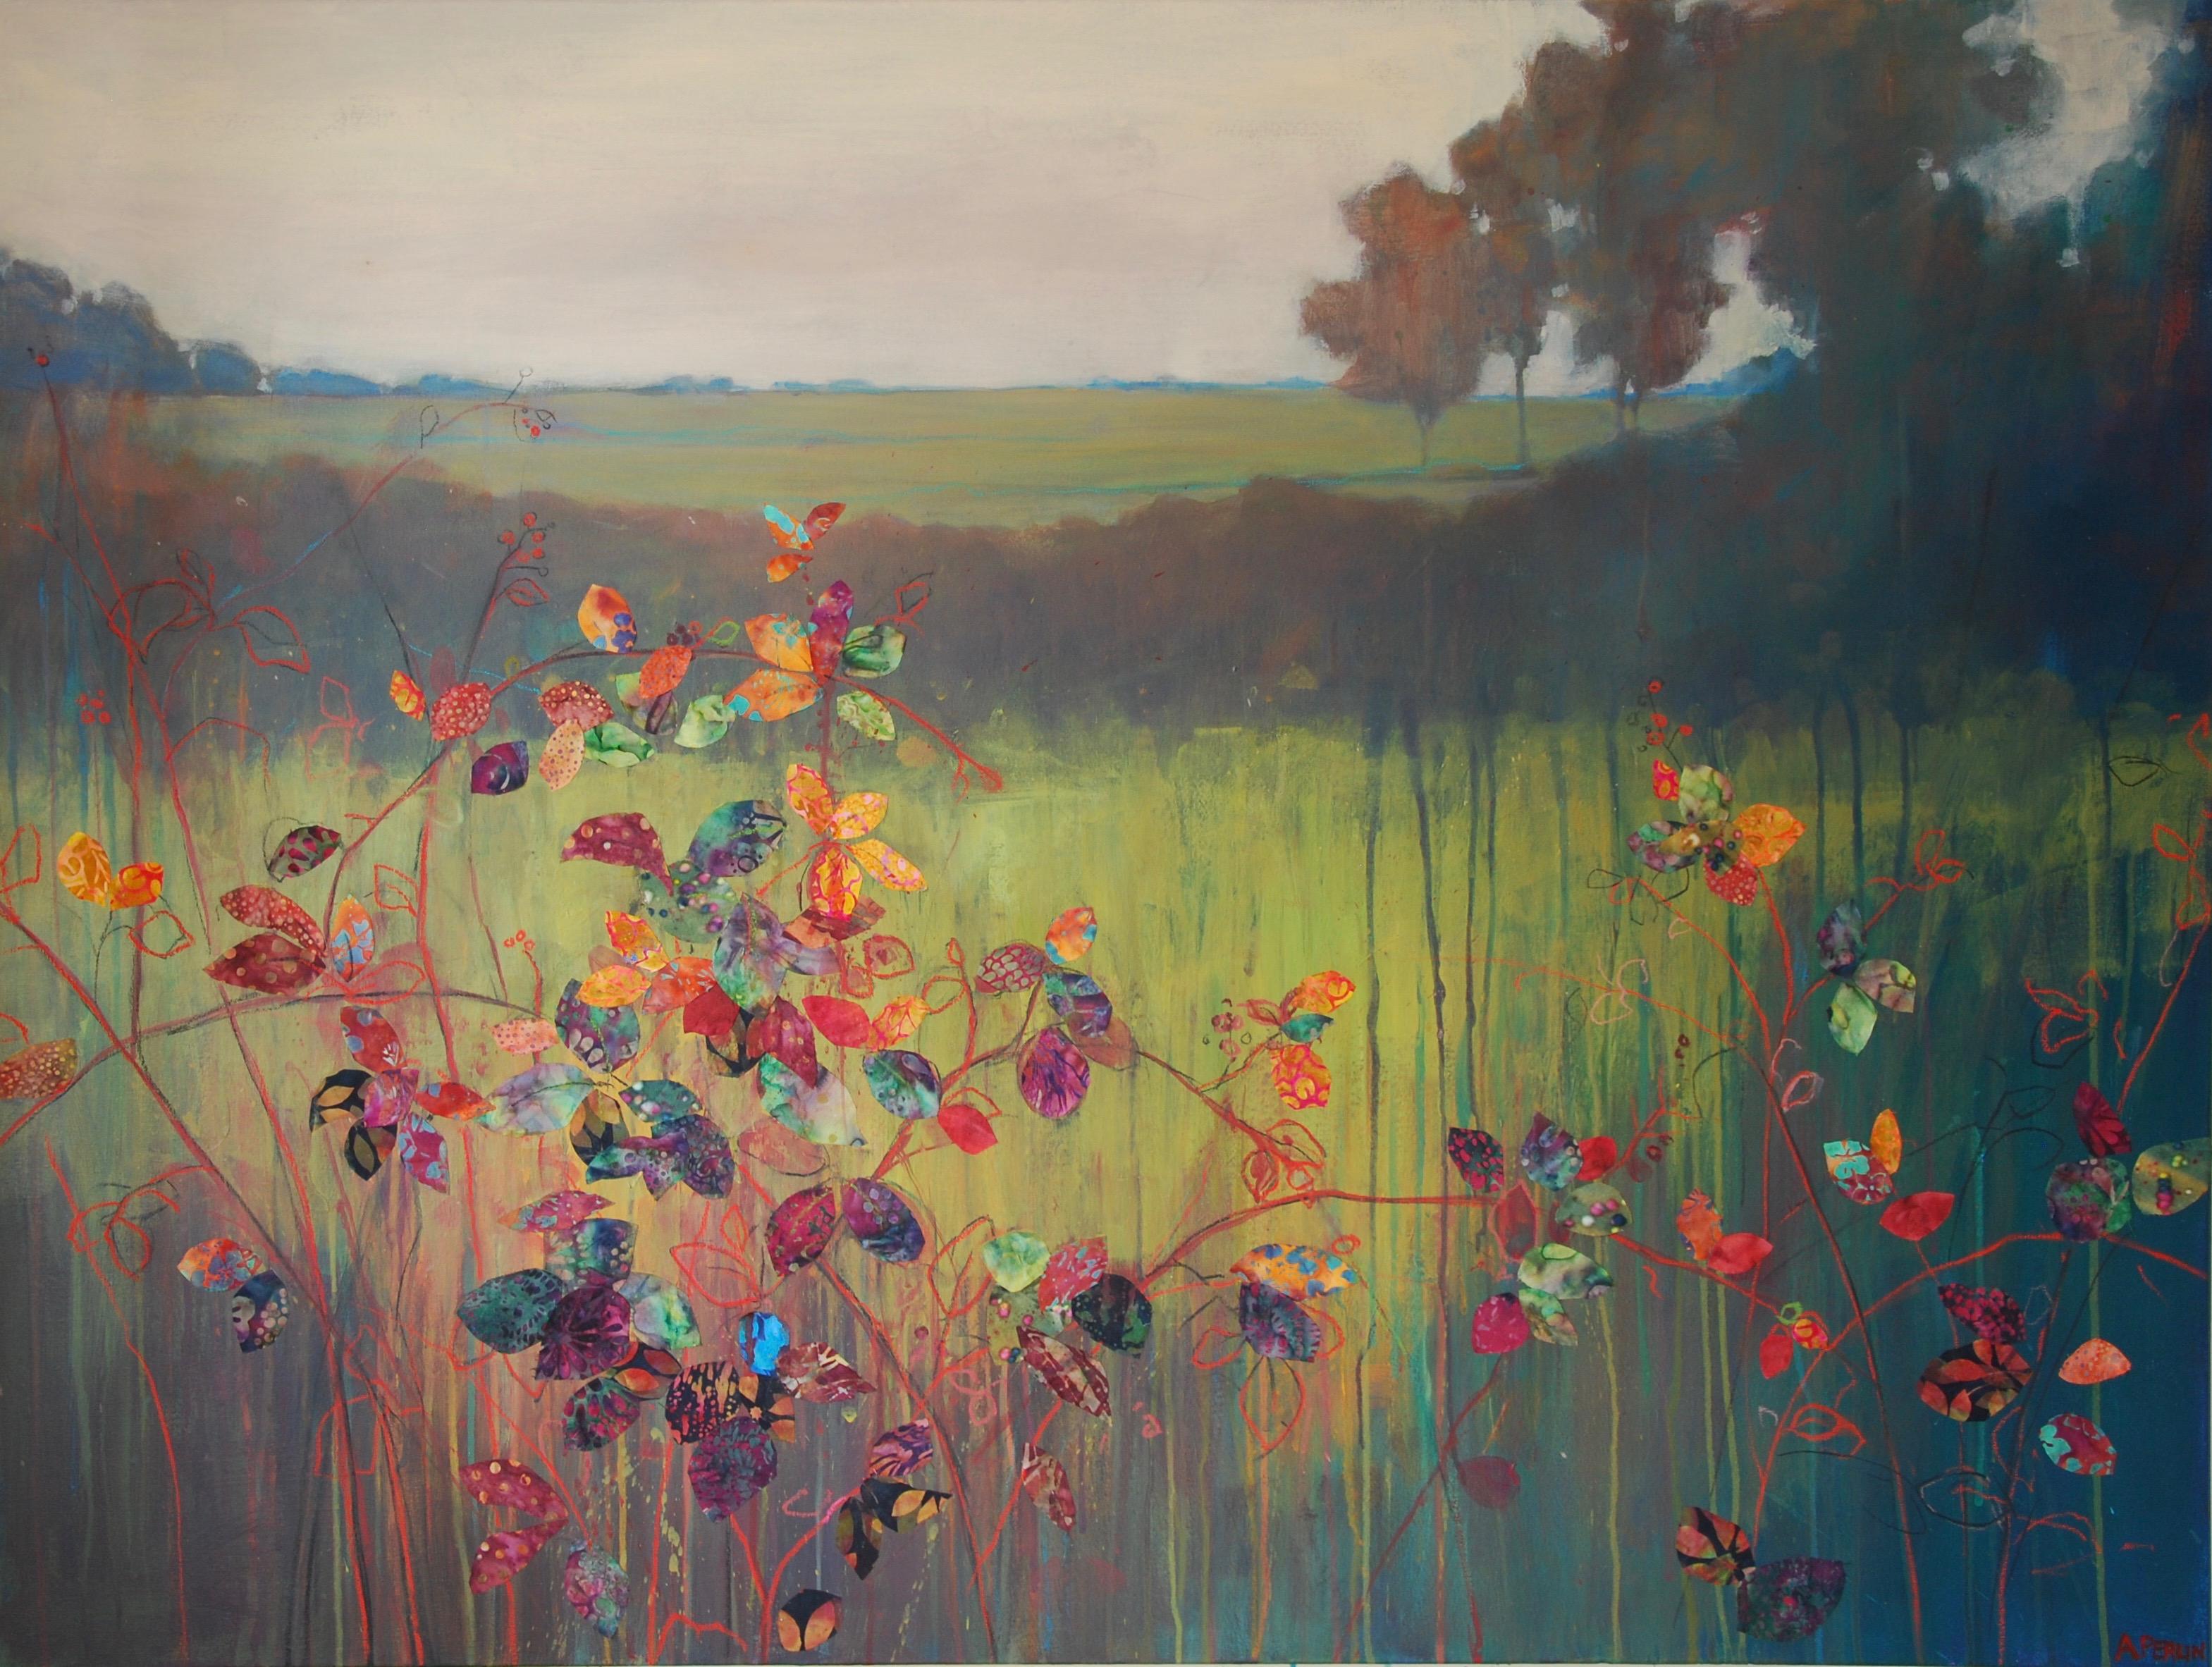 'Tangled Brambles' Anna Perlin Mixed media, 91cmx122cm, 2017